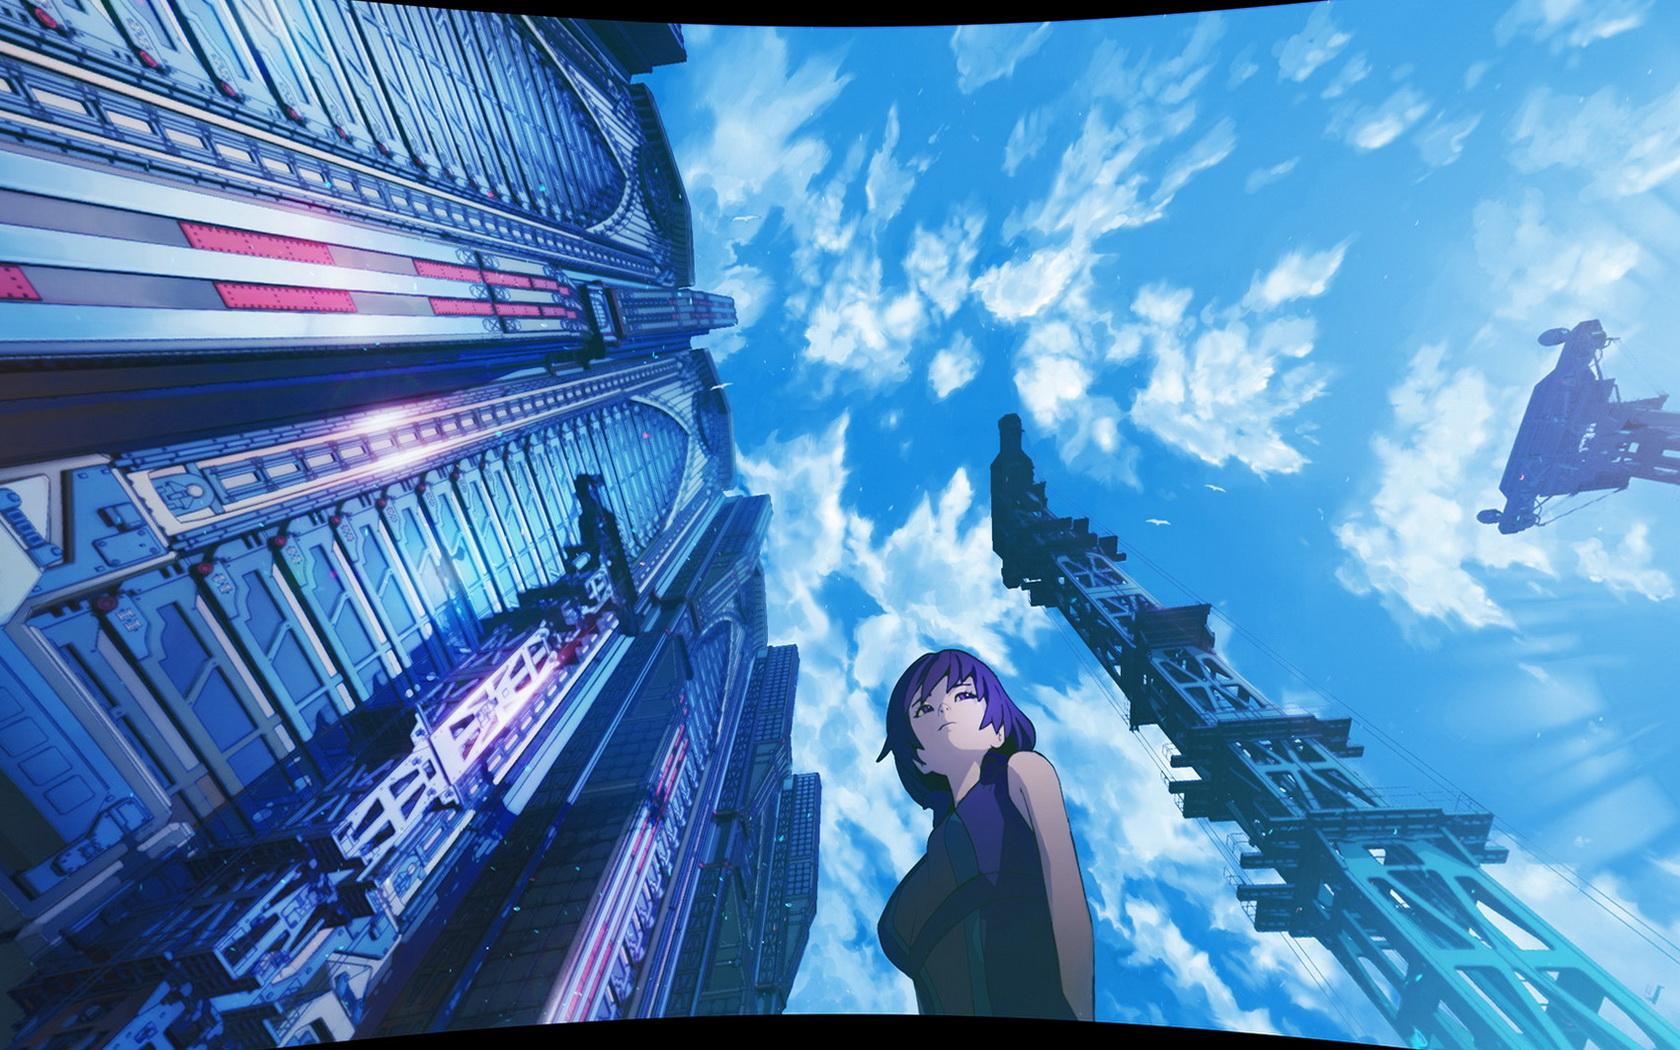 Anime Beauty Blue Buildings Wallpaper 13694 Wallpaper 1680x1050